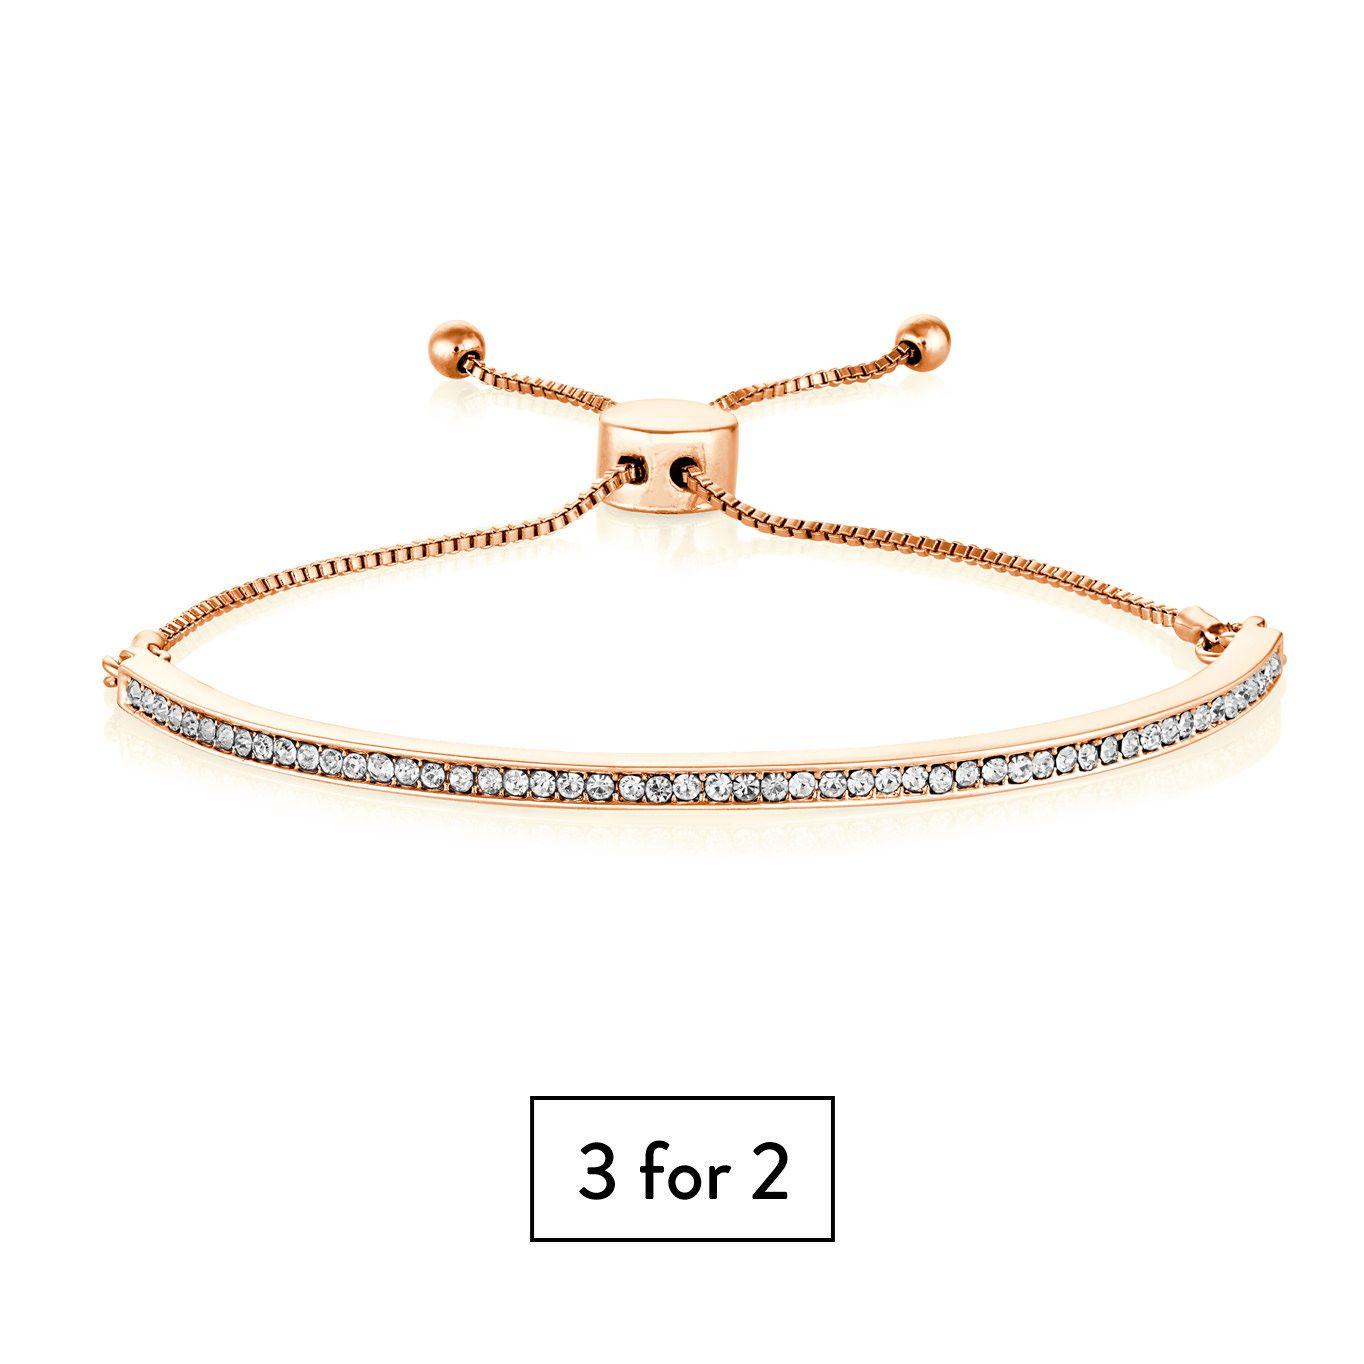 Buckley London Portobello Bracelet - Rose Gold